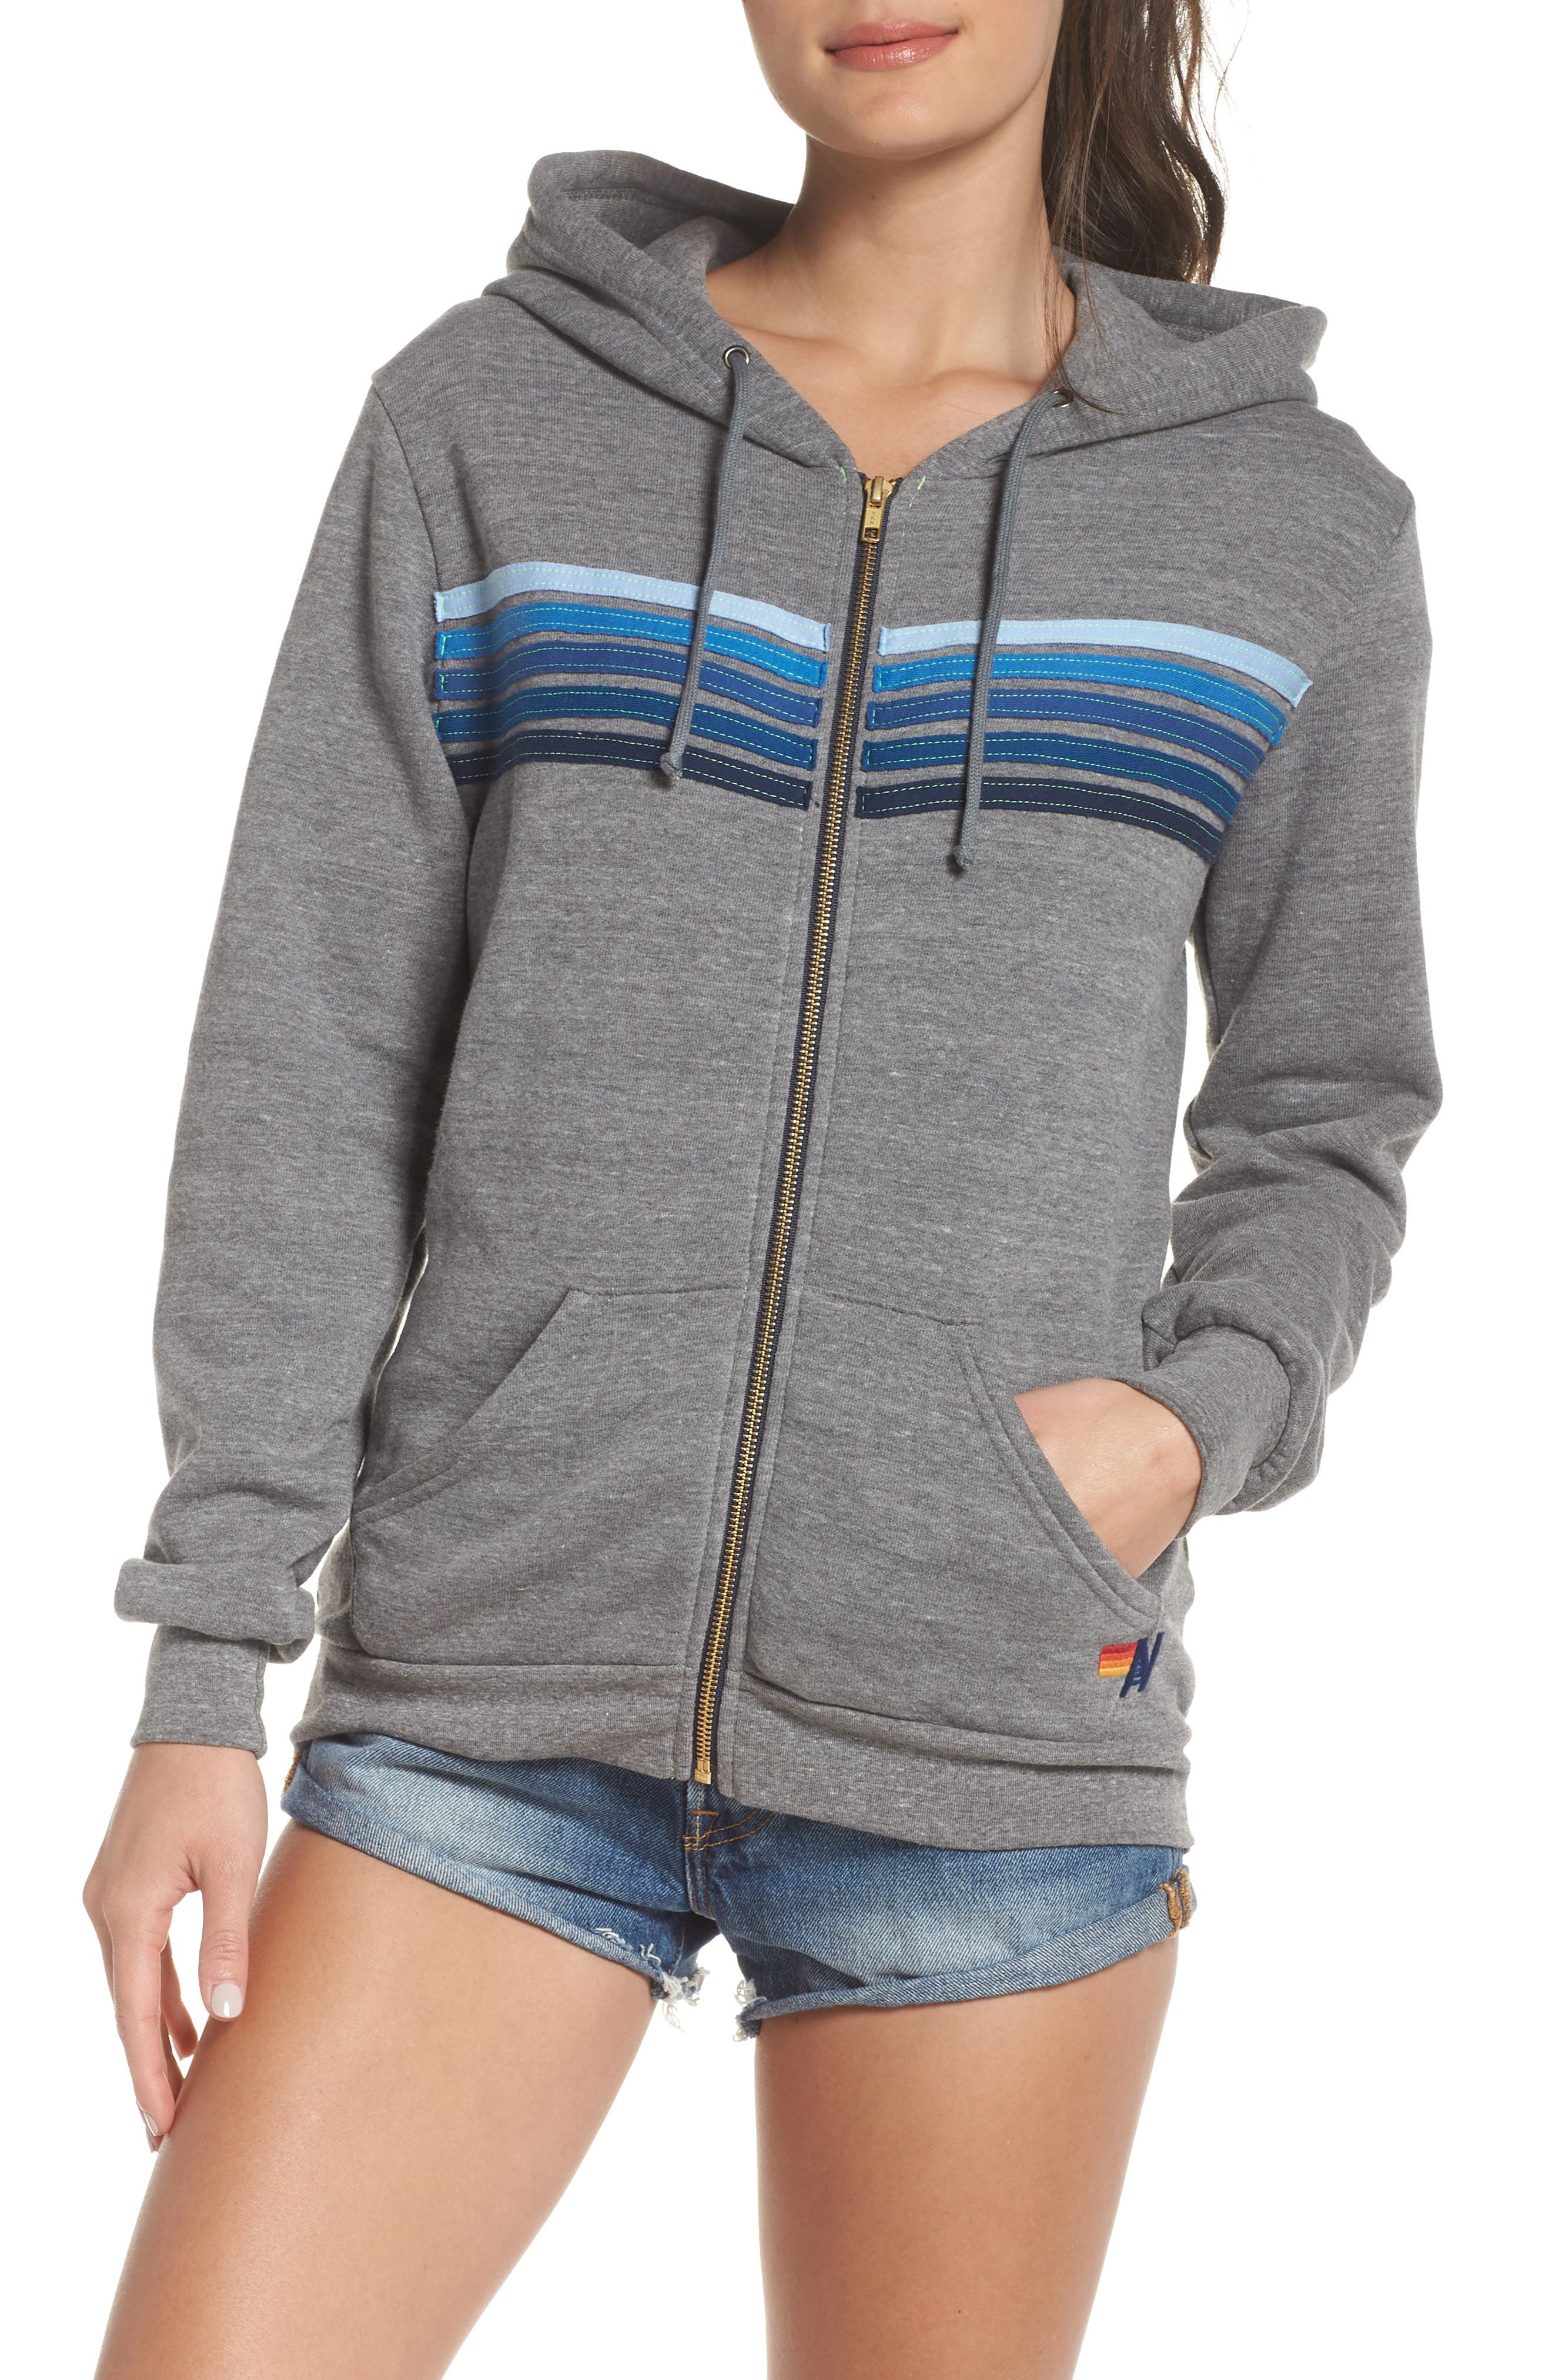 5-Stripe Zip Hoodie,                             Alternate thumbnail 4, color,                             Heather Grey/ Blue Stripes